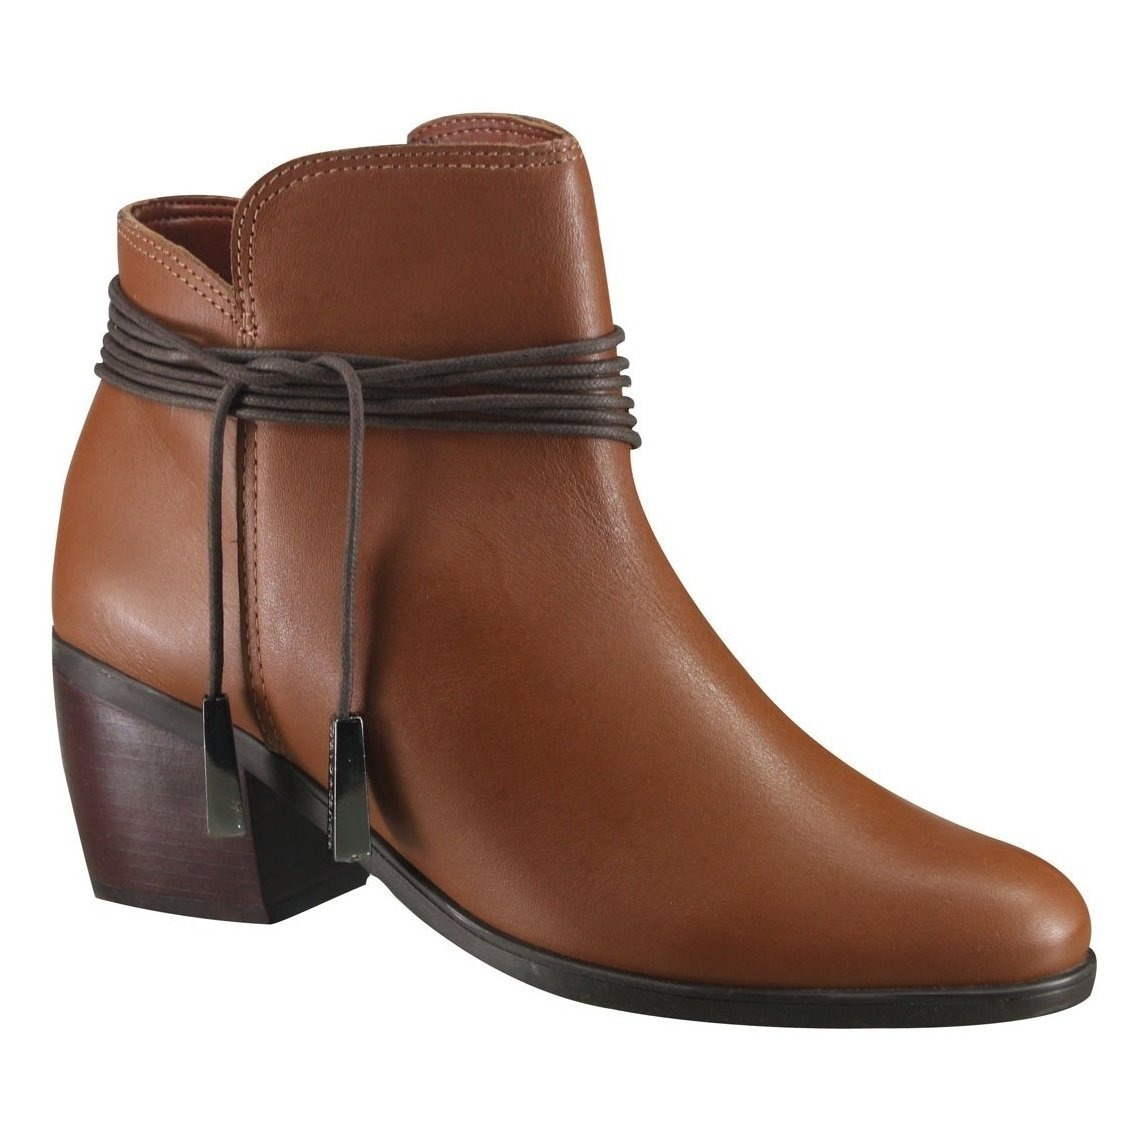 09fd3d16c3 Bota Cravo E Canela Ankle Boot 144213-2